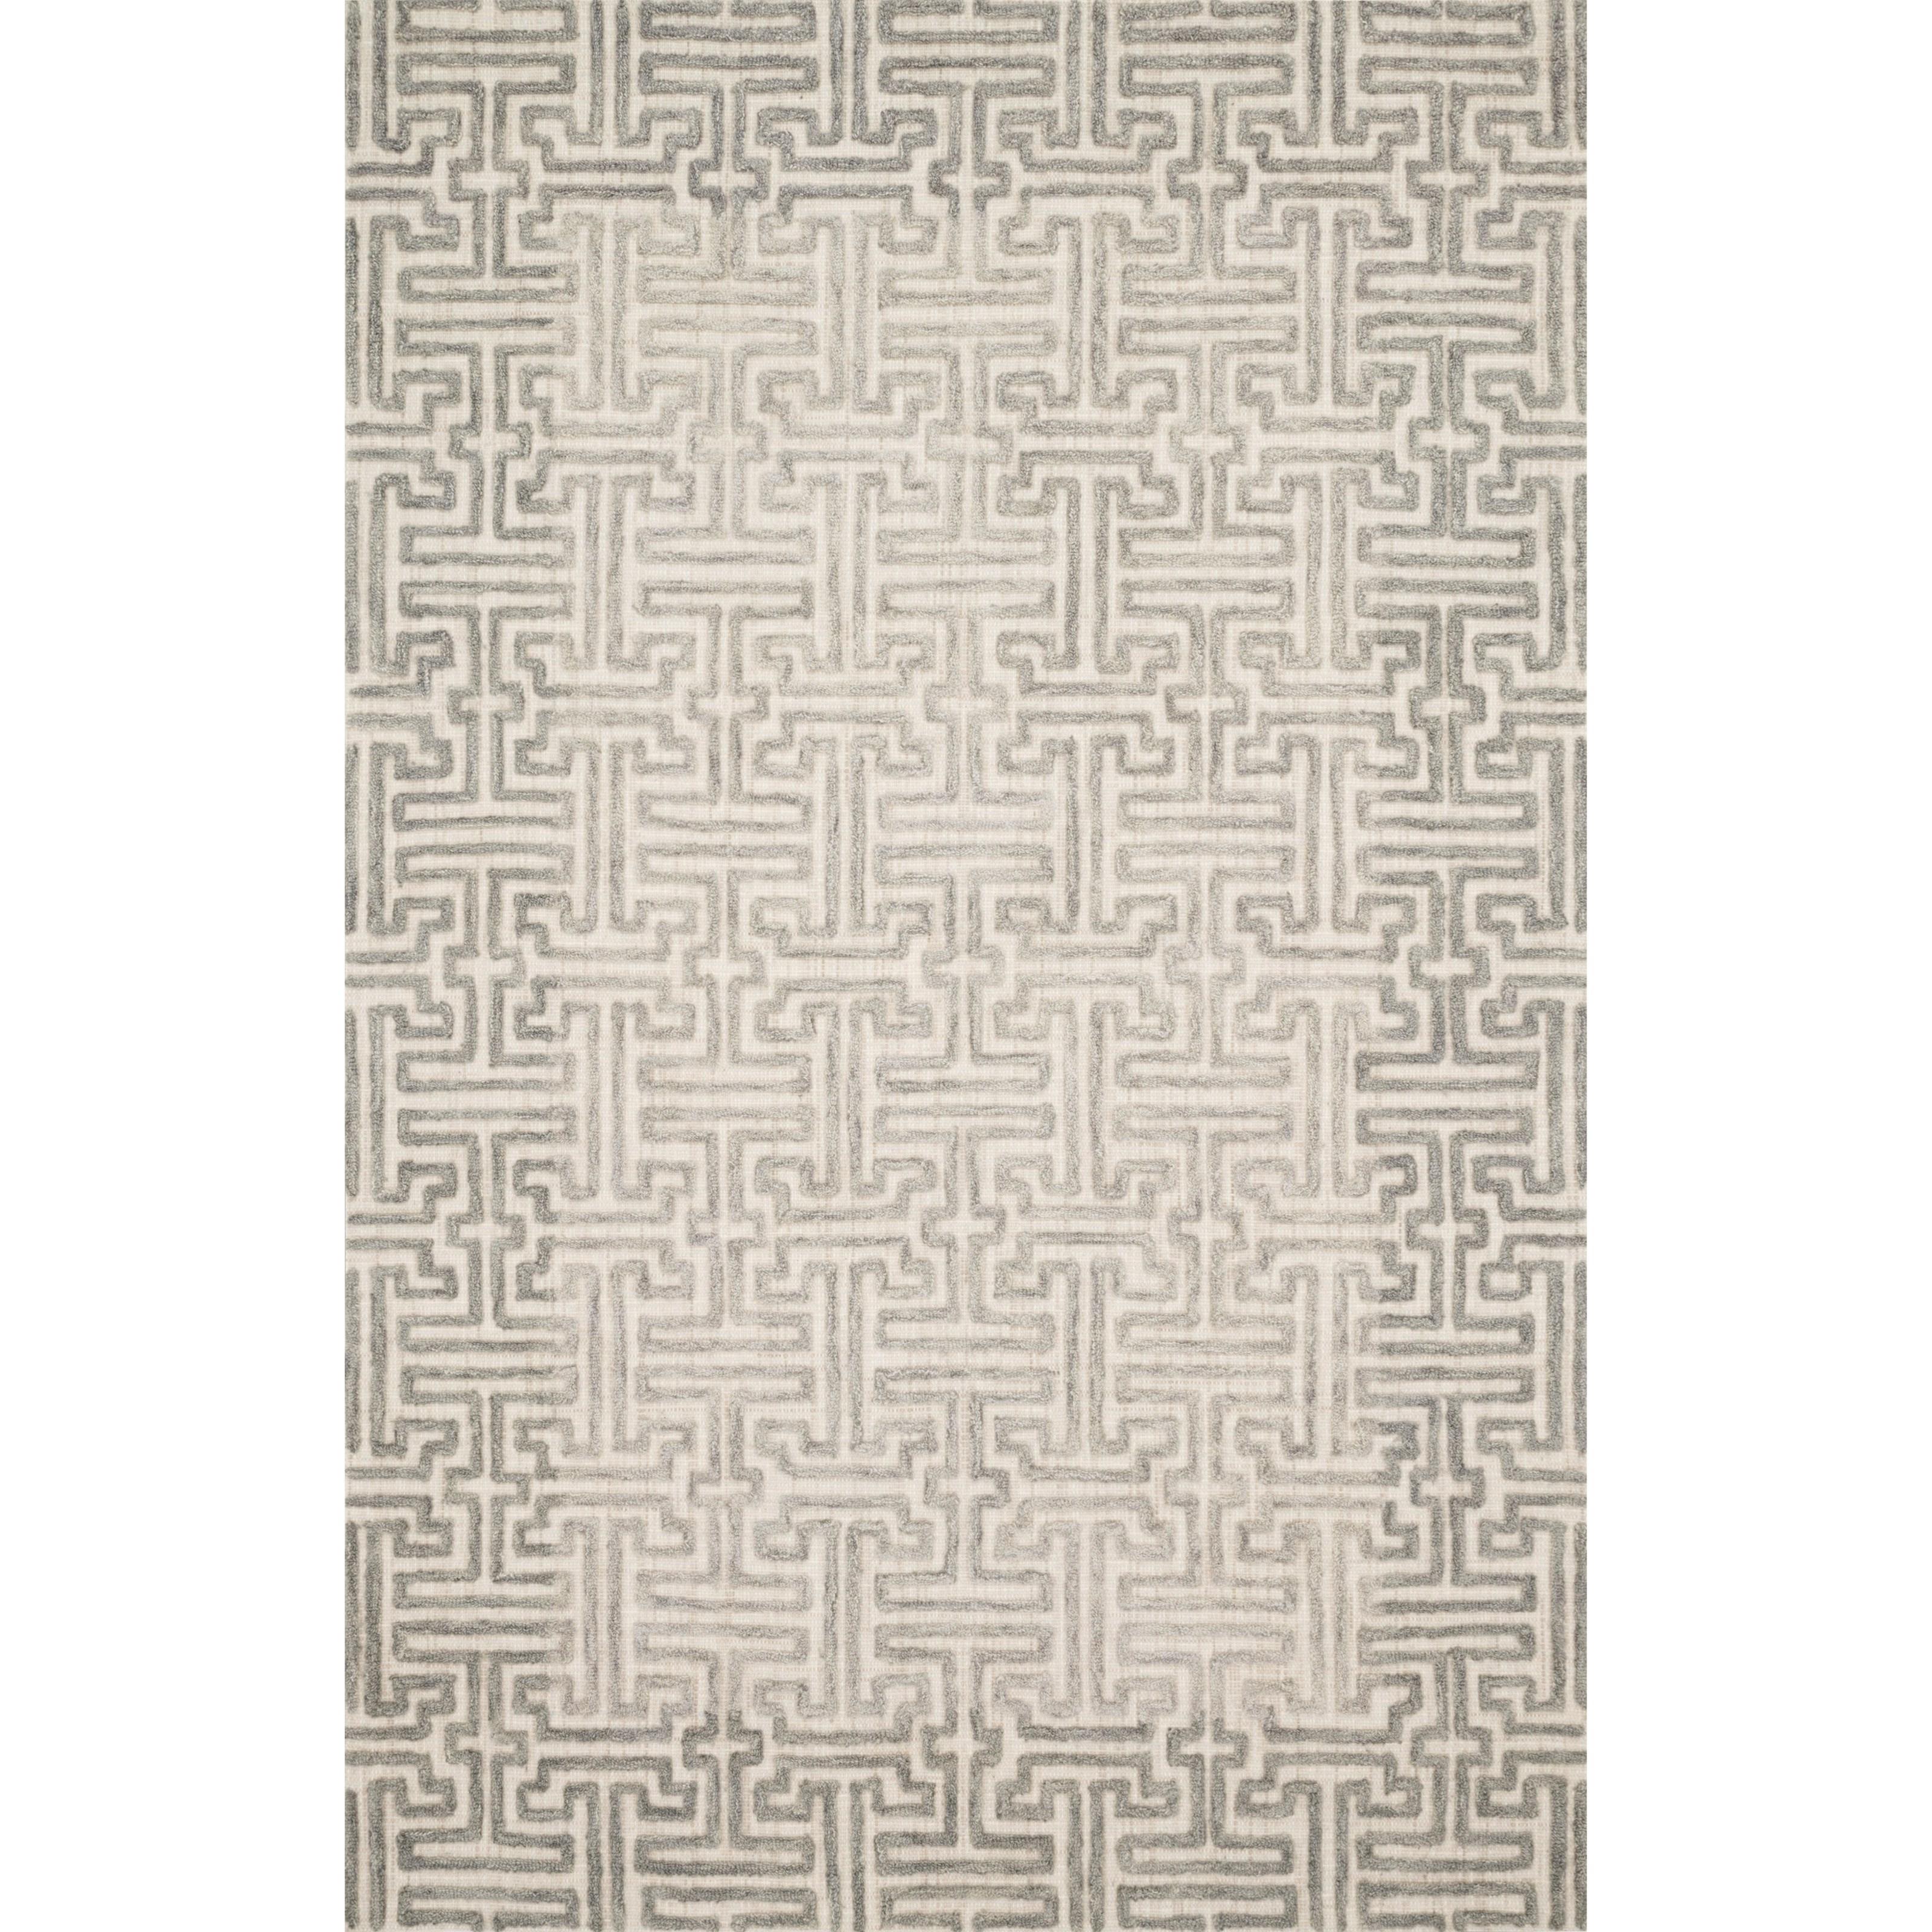 "Ehren 2'3"" x 3'9"" Stone / Sand Rug by Loloi Rugs at Virginia Furniture Market"